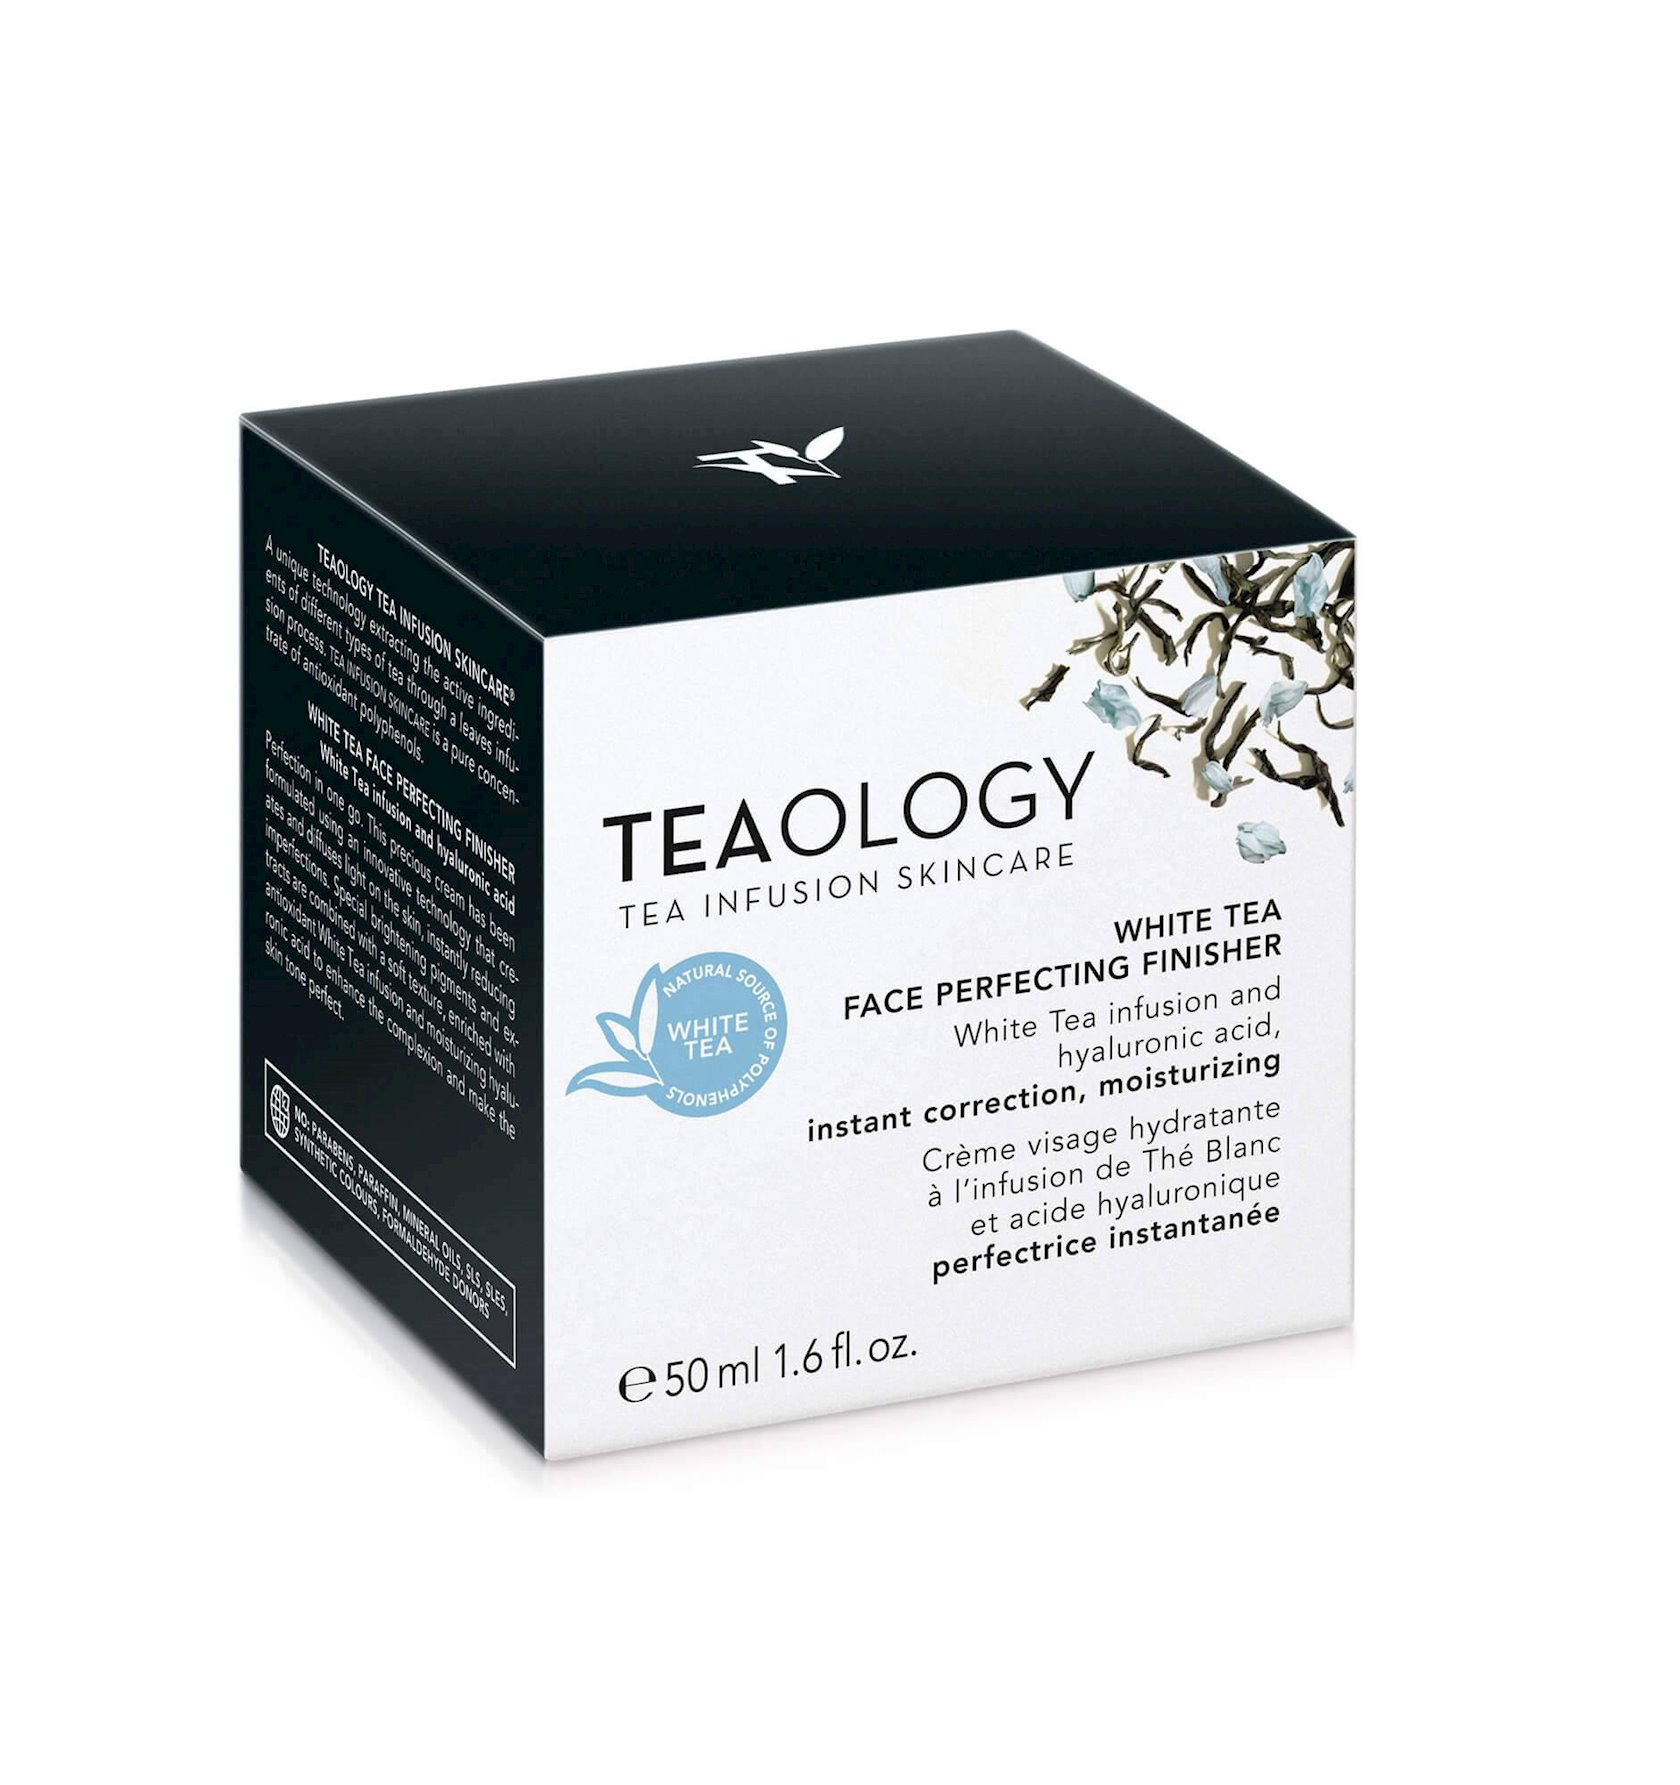 Üz üçün tonlaşdırıcı krem Teaology White Tea 50 ml